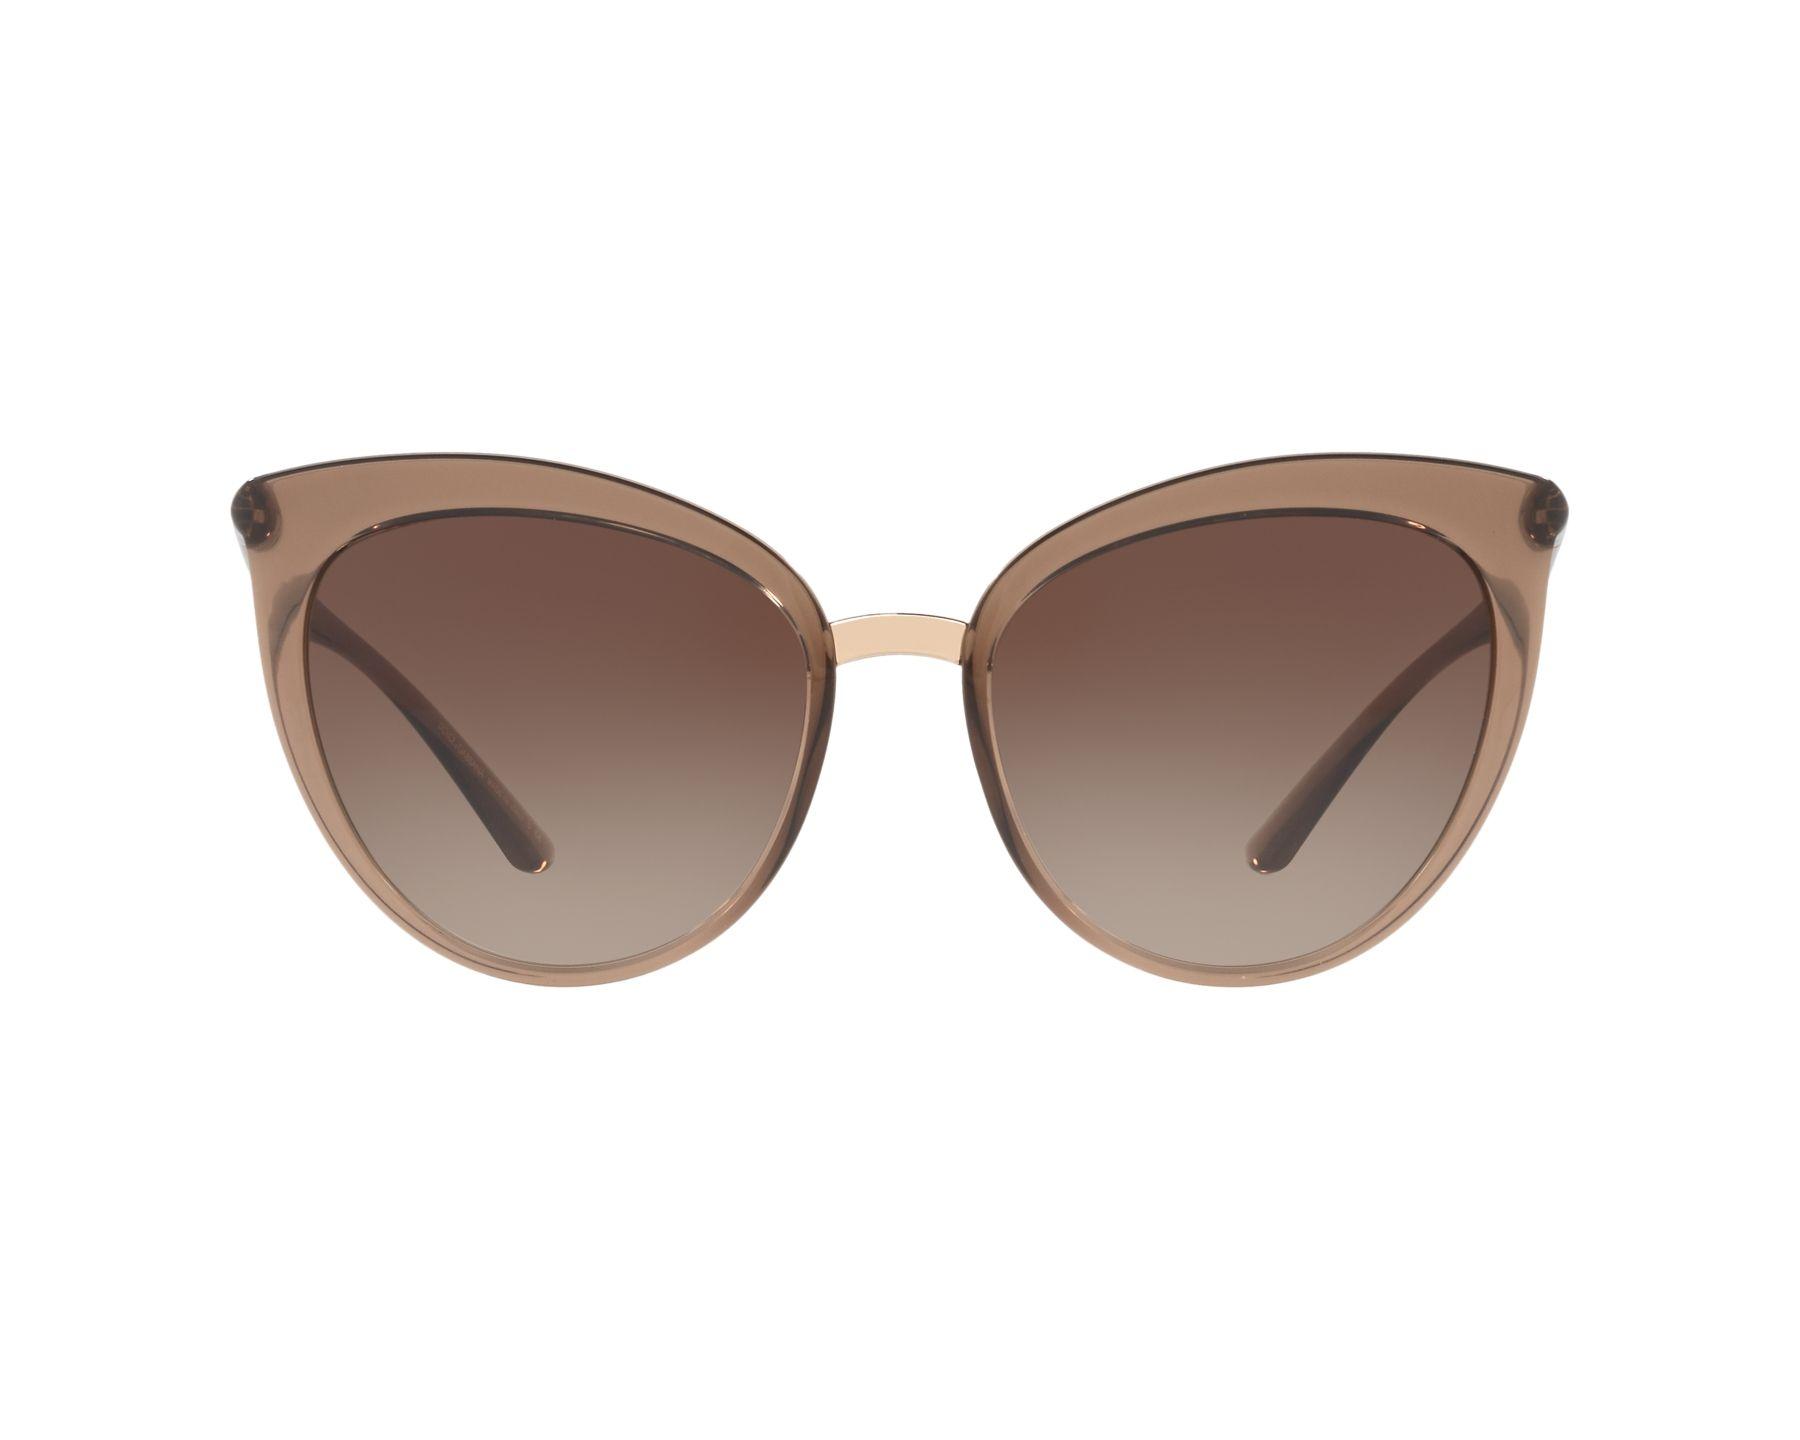 3459481b82 Sunglasses Dolce   Gabbana DG-6113 315913 55-18 Brown Brown 360 degree view